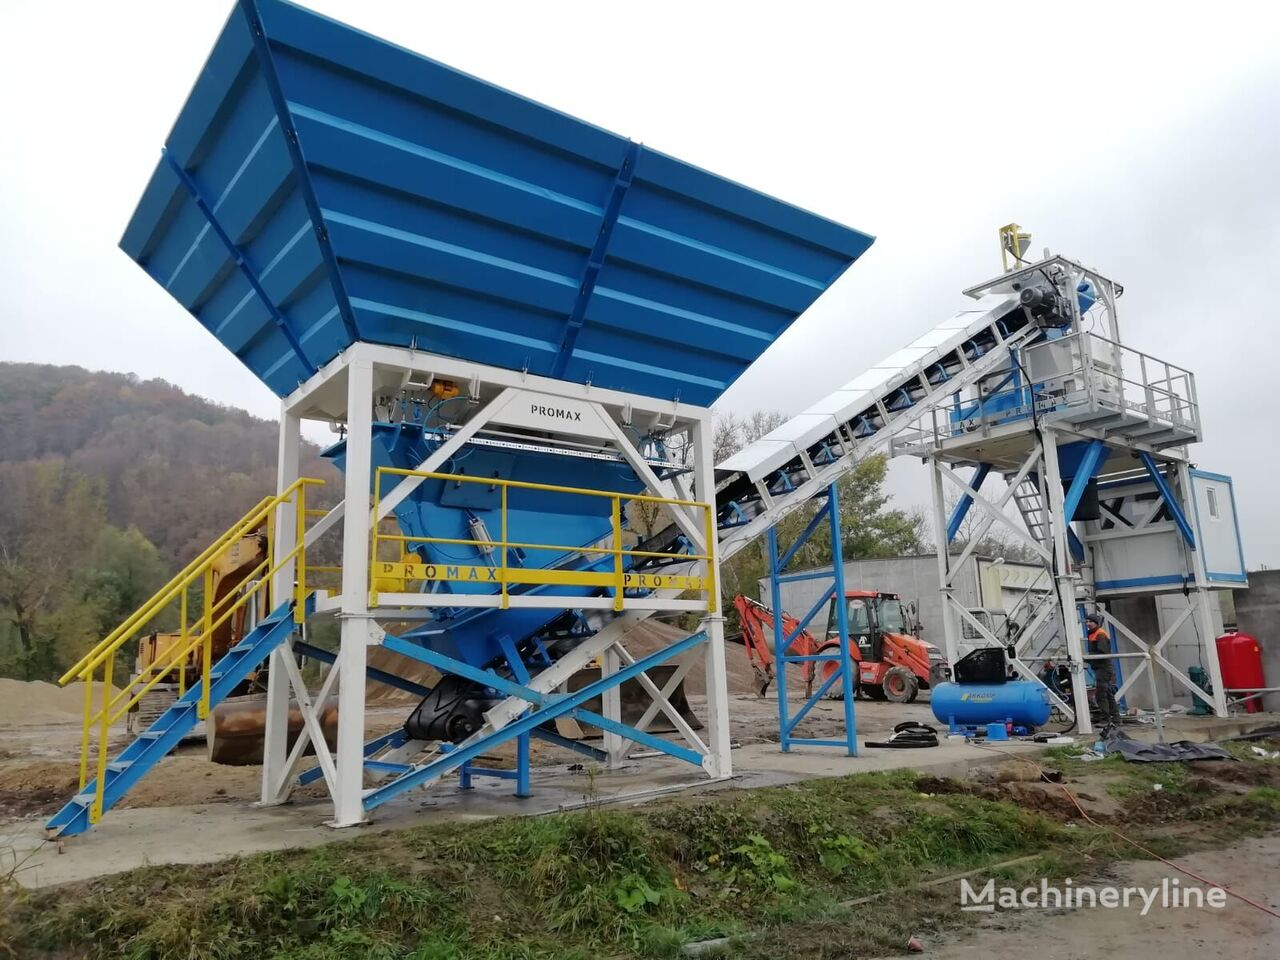 ny PROMAX Compact Concrete Batching Plant PROMAX C60-SNG-PLUS (60m³/h) betongfabrikk